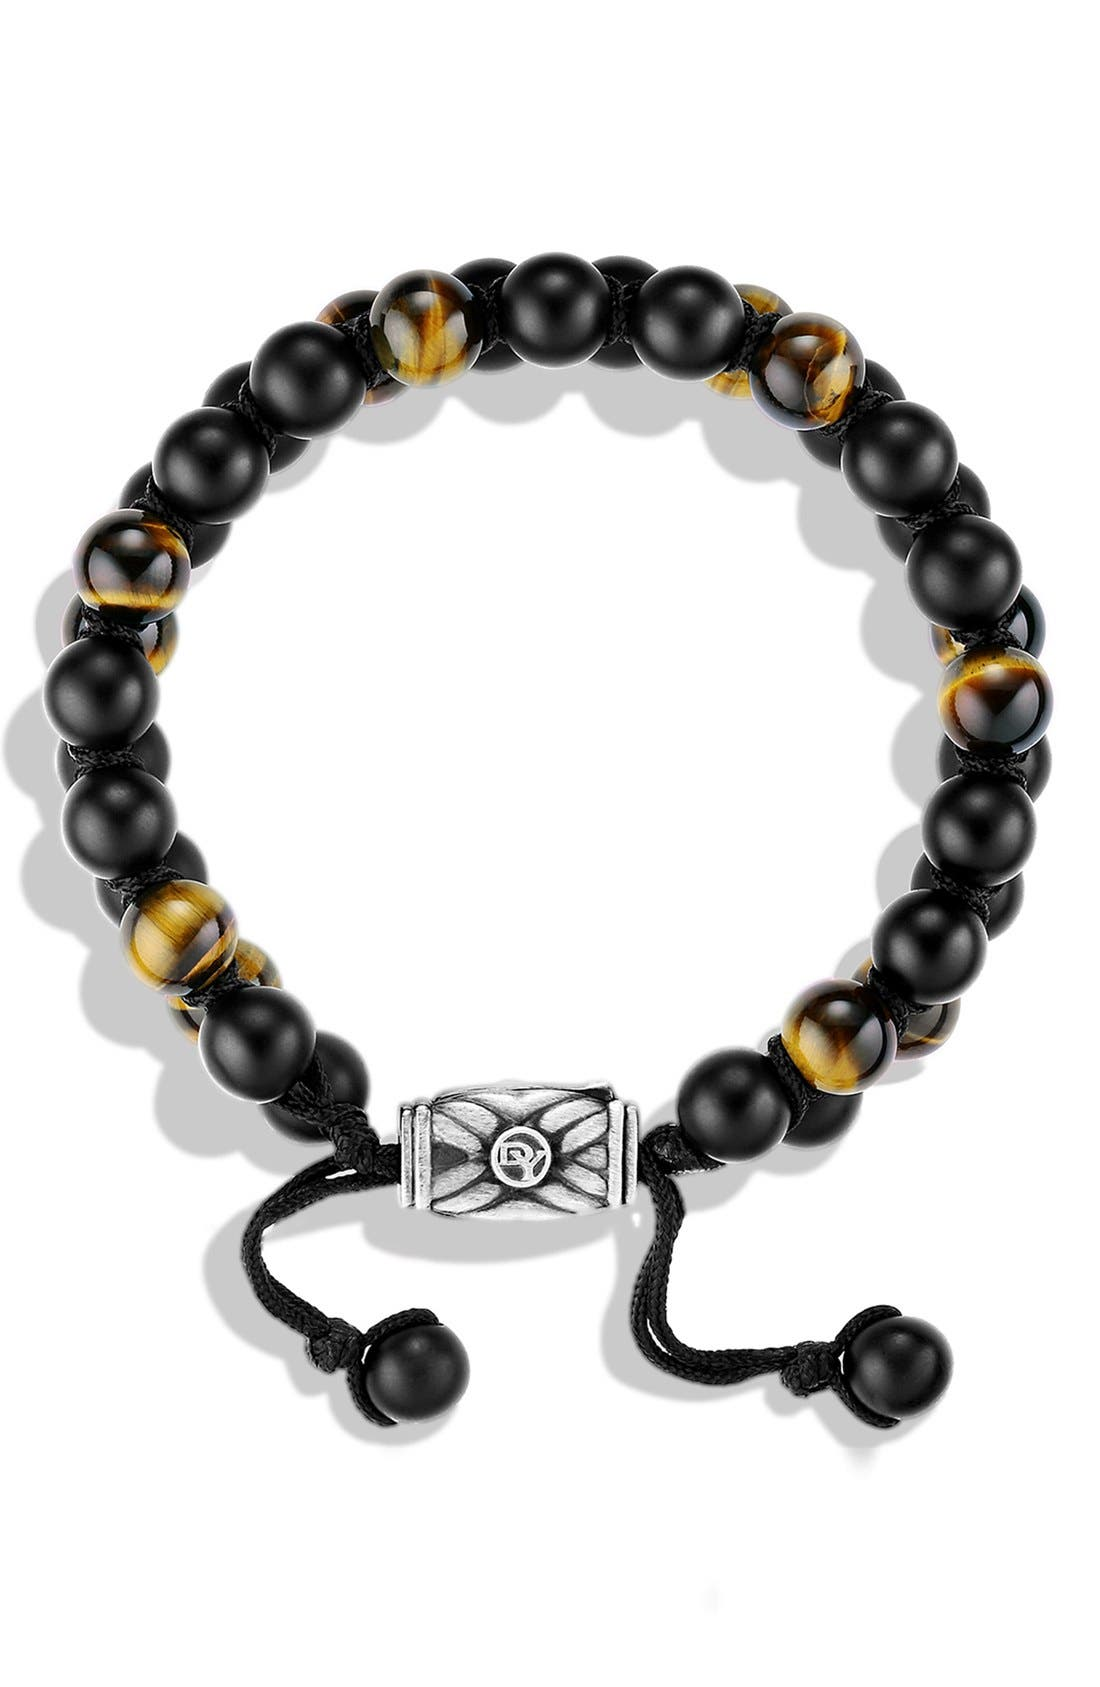 DAVID YURMAN,                             'Spiritual Beads' Two-Row Stone Bracelet,                             Alternate thumbnail 2, color,                             BLACK ONYX